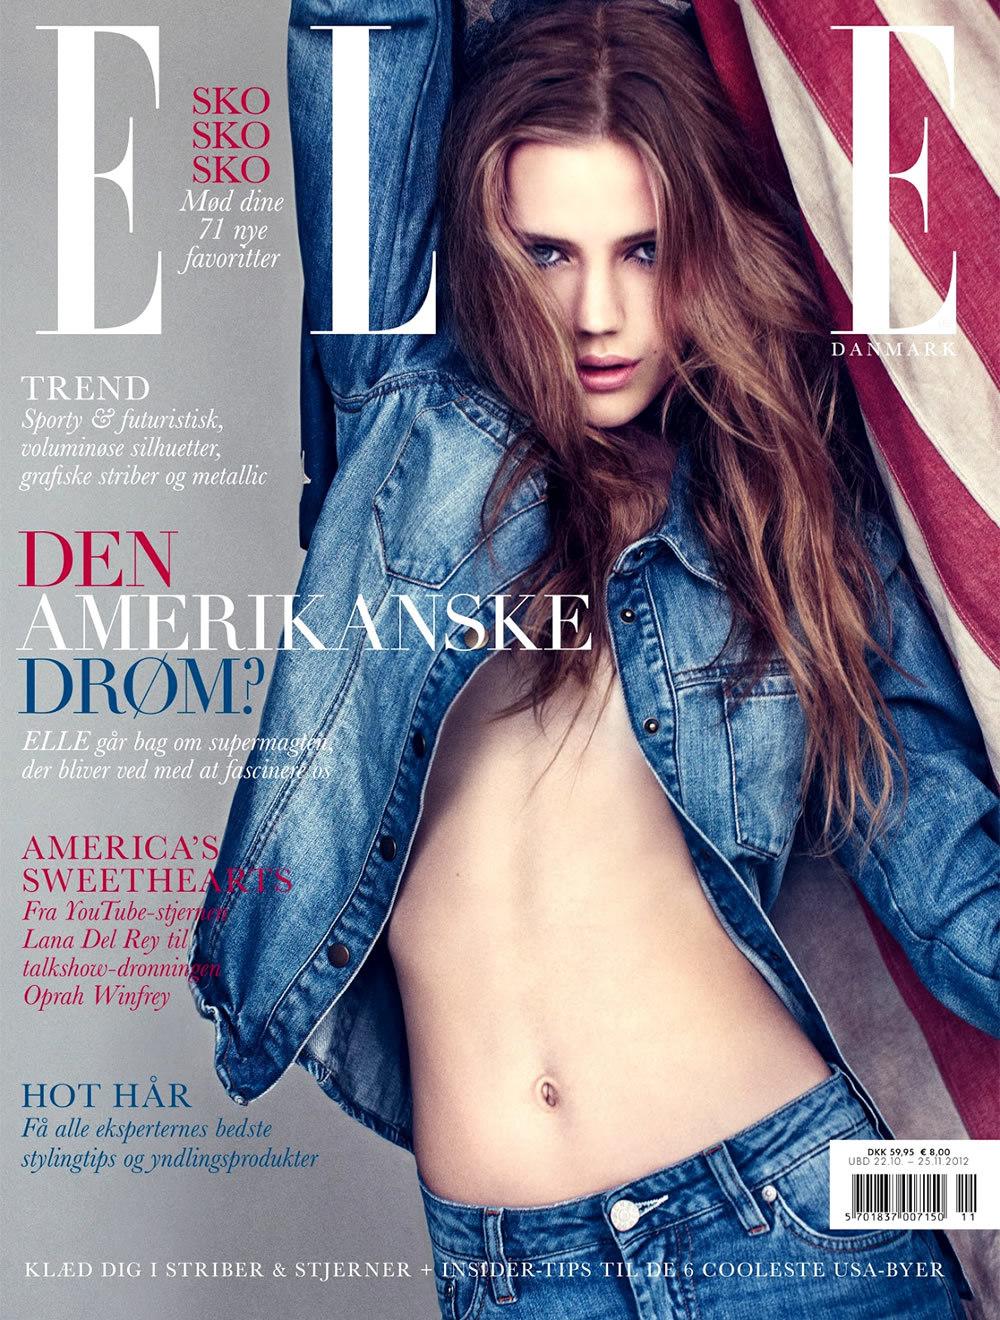 Esther Heesch covers Danish Vogue. Heesch is 16-years-old.